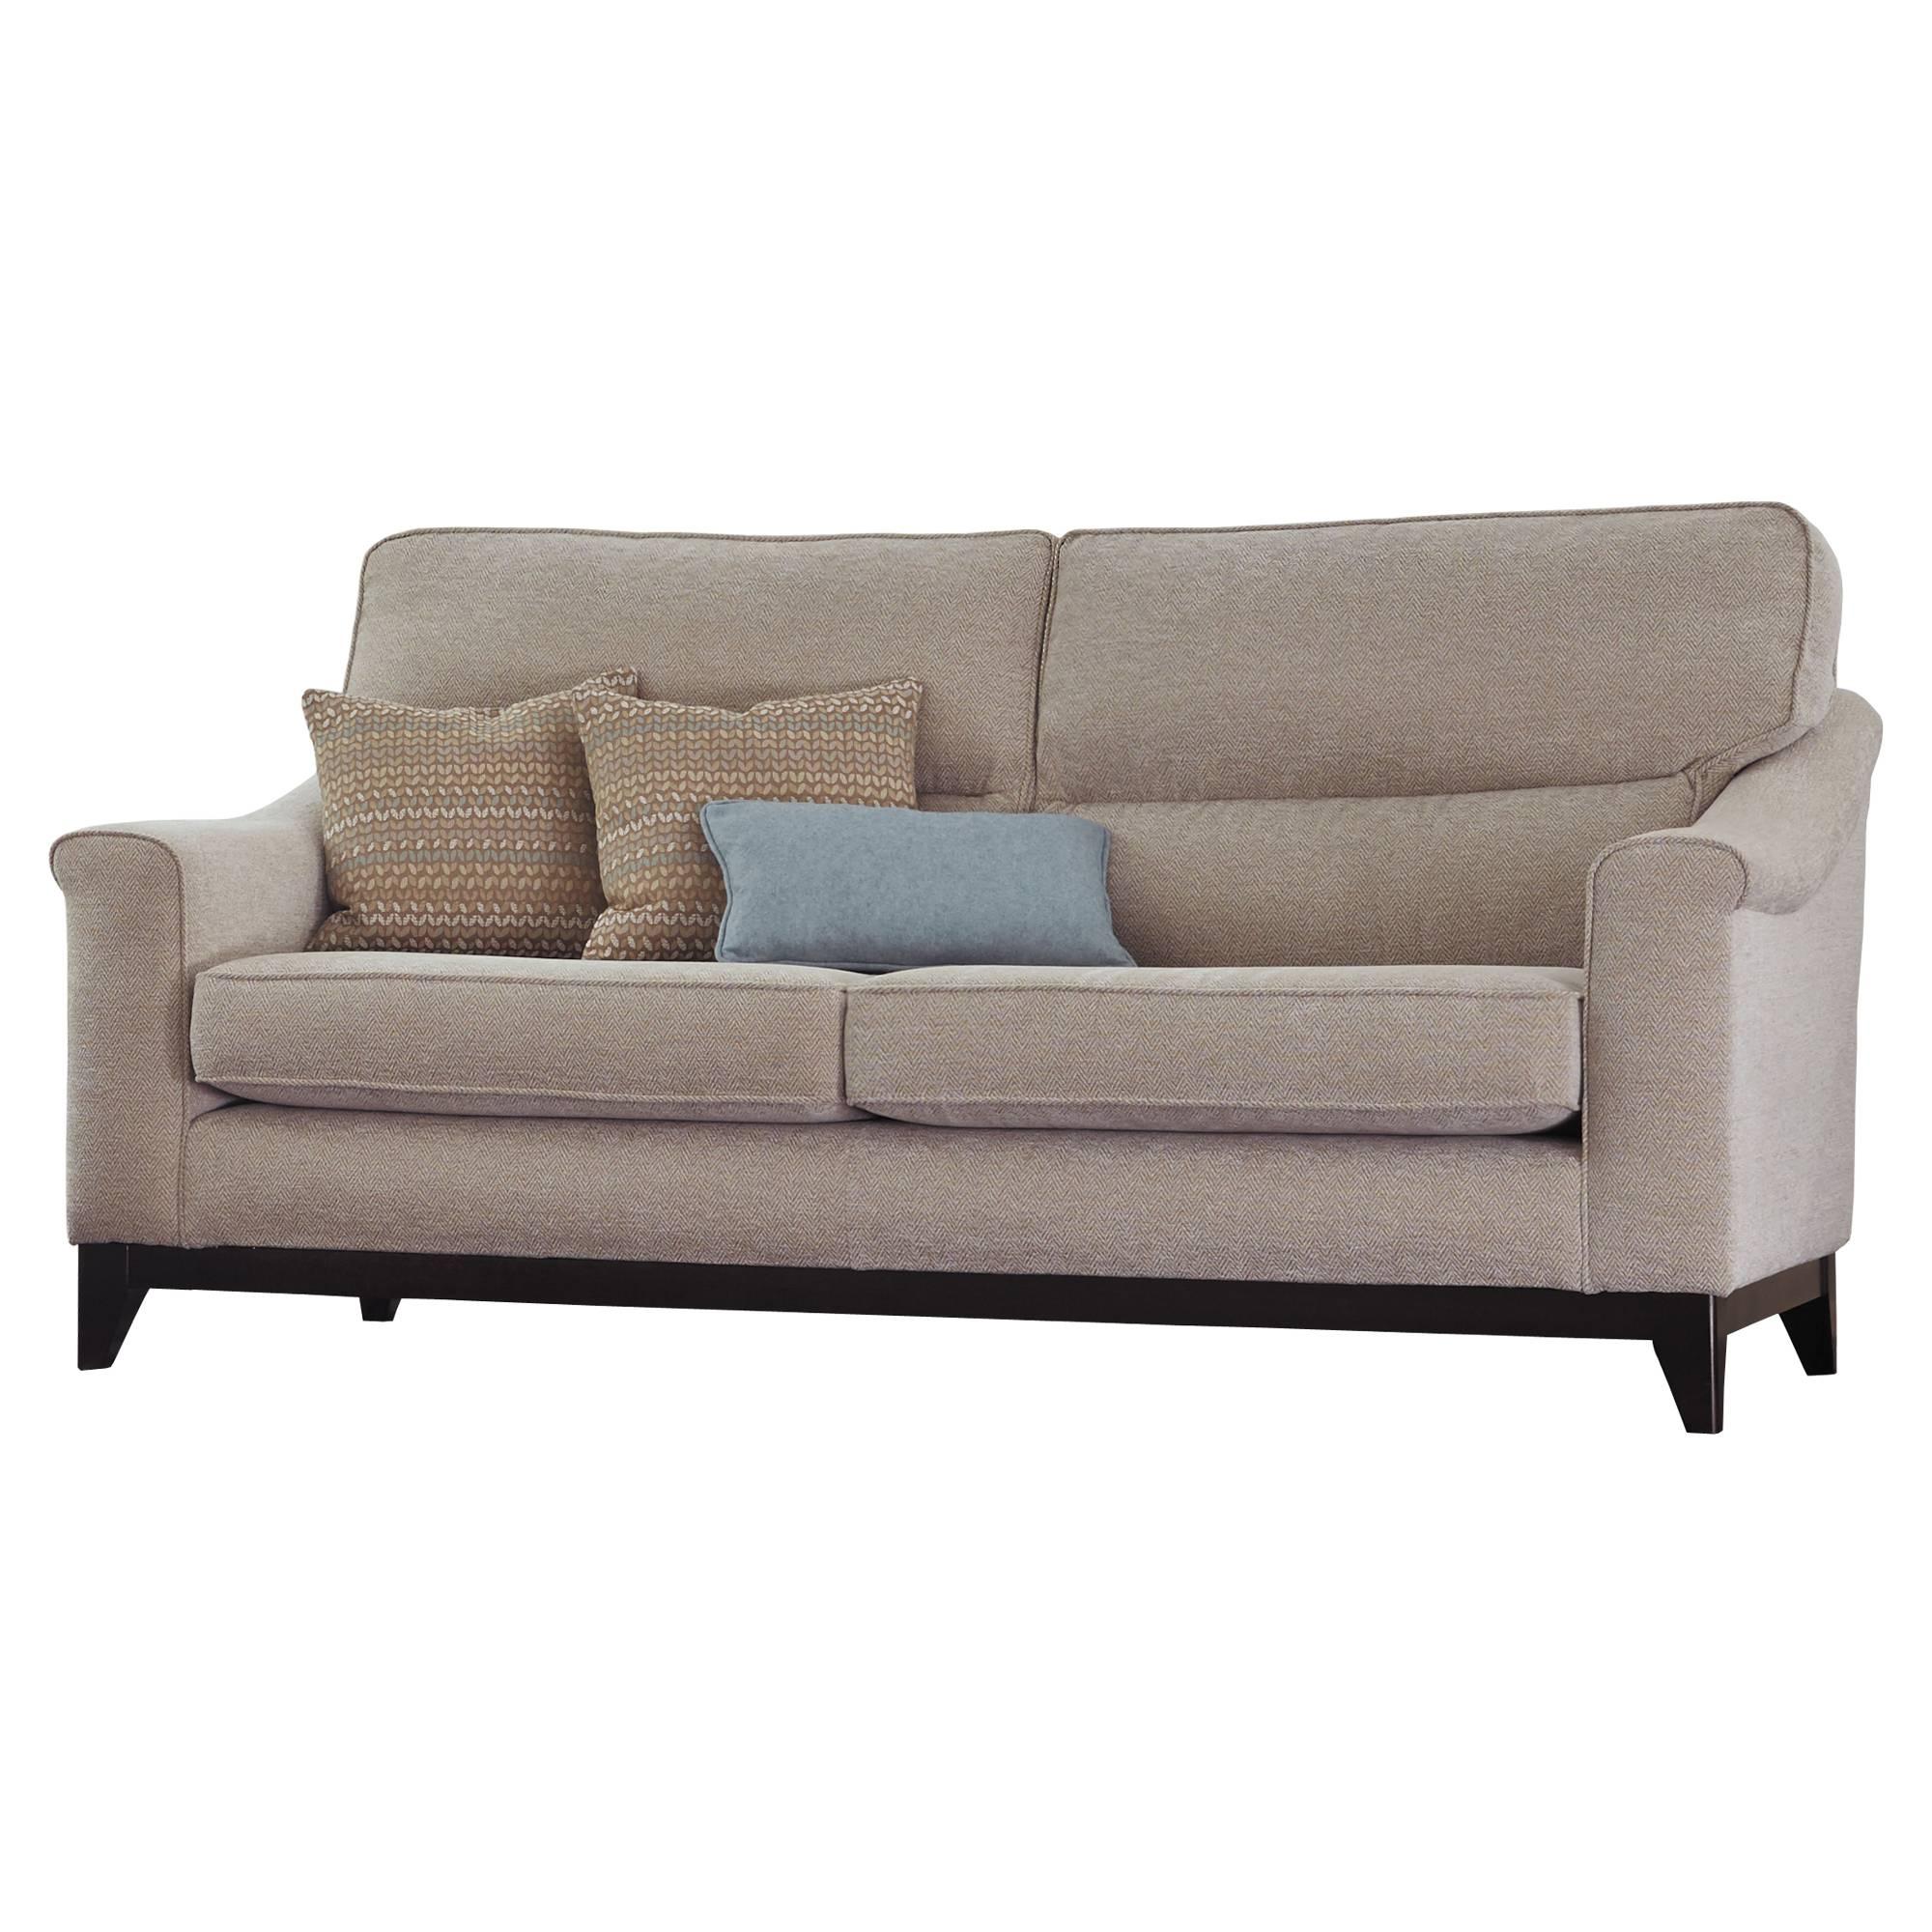 Parker Knoll Montana 2 5 Seater Sofa Fabric A All Sofa